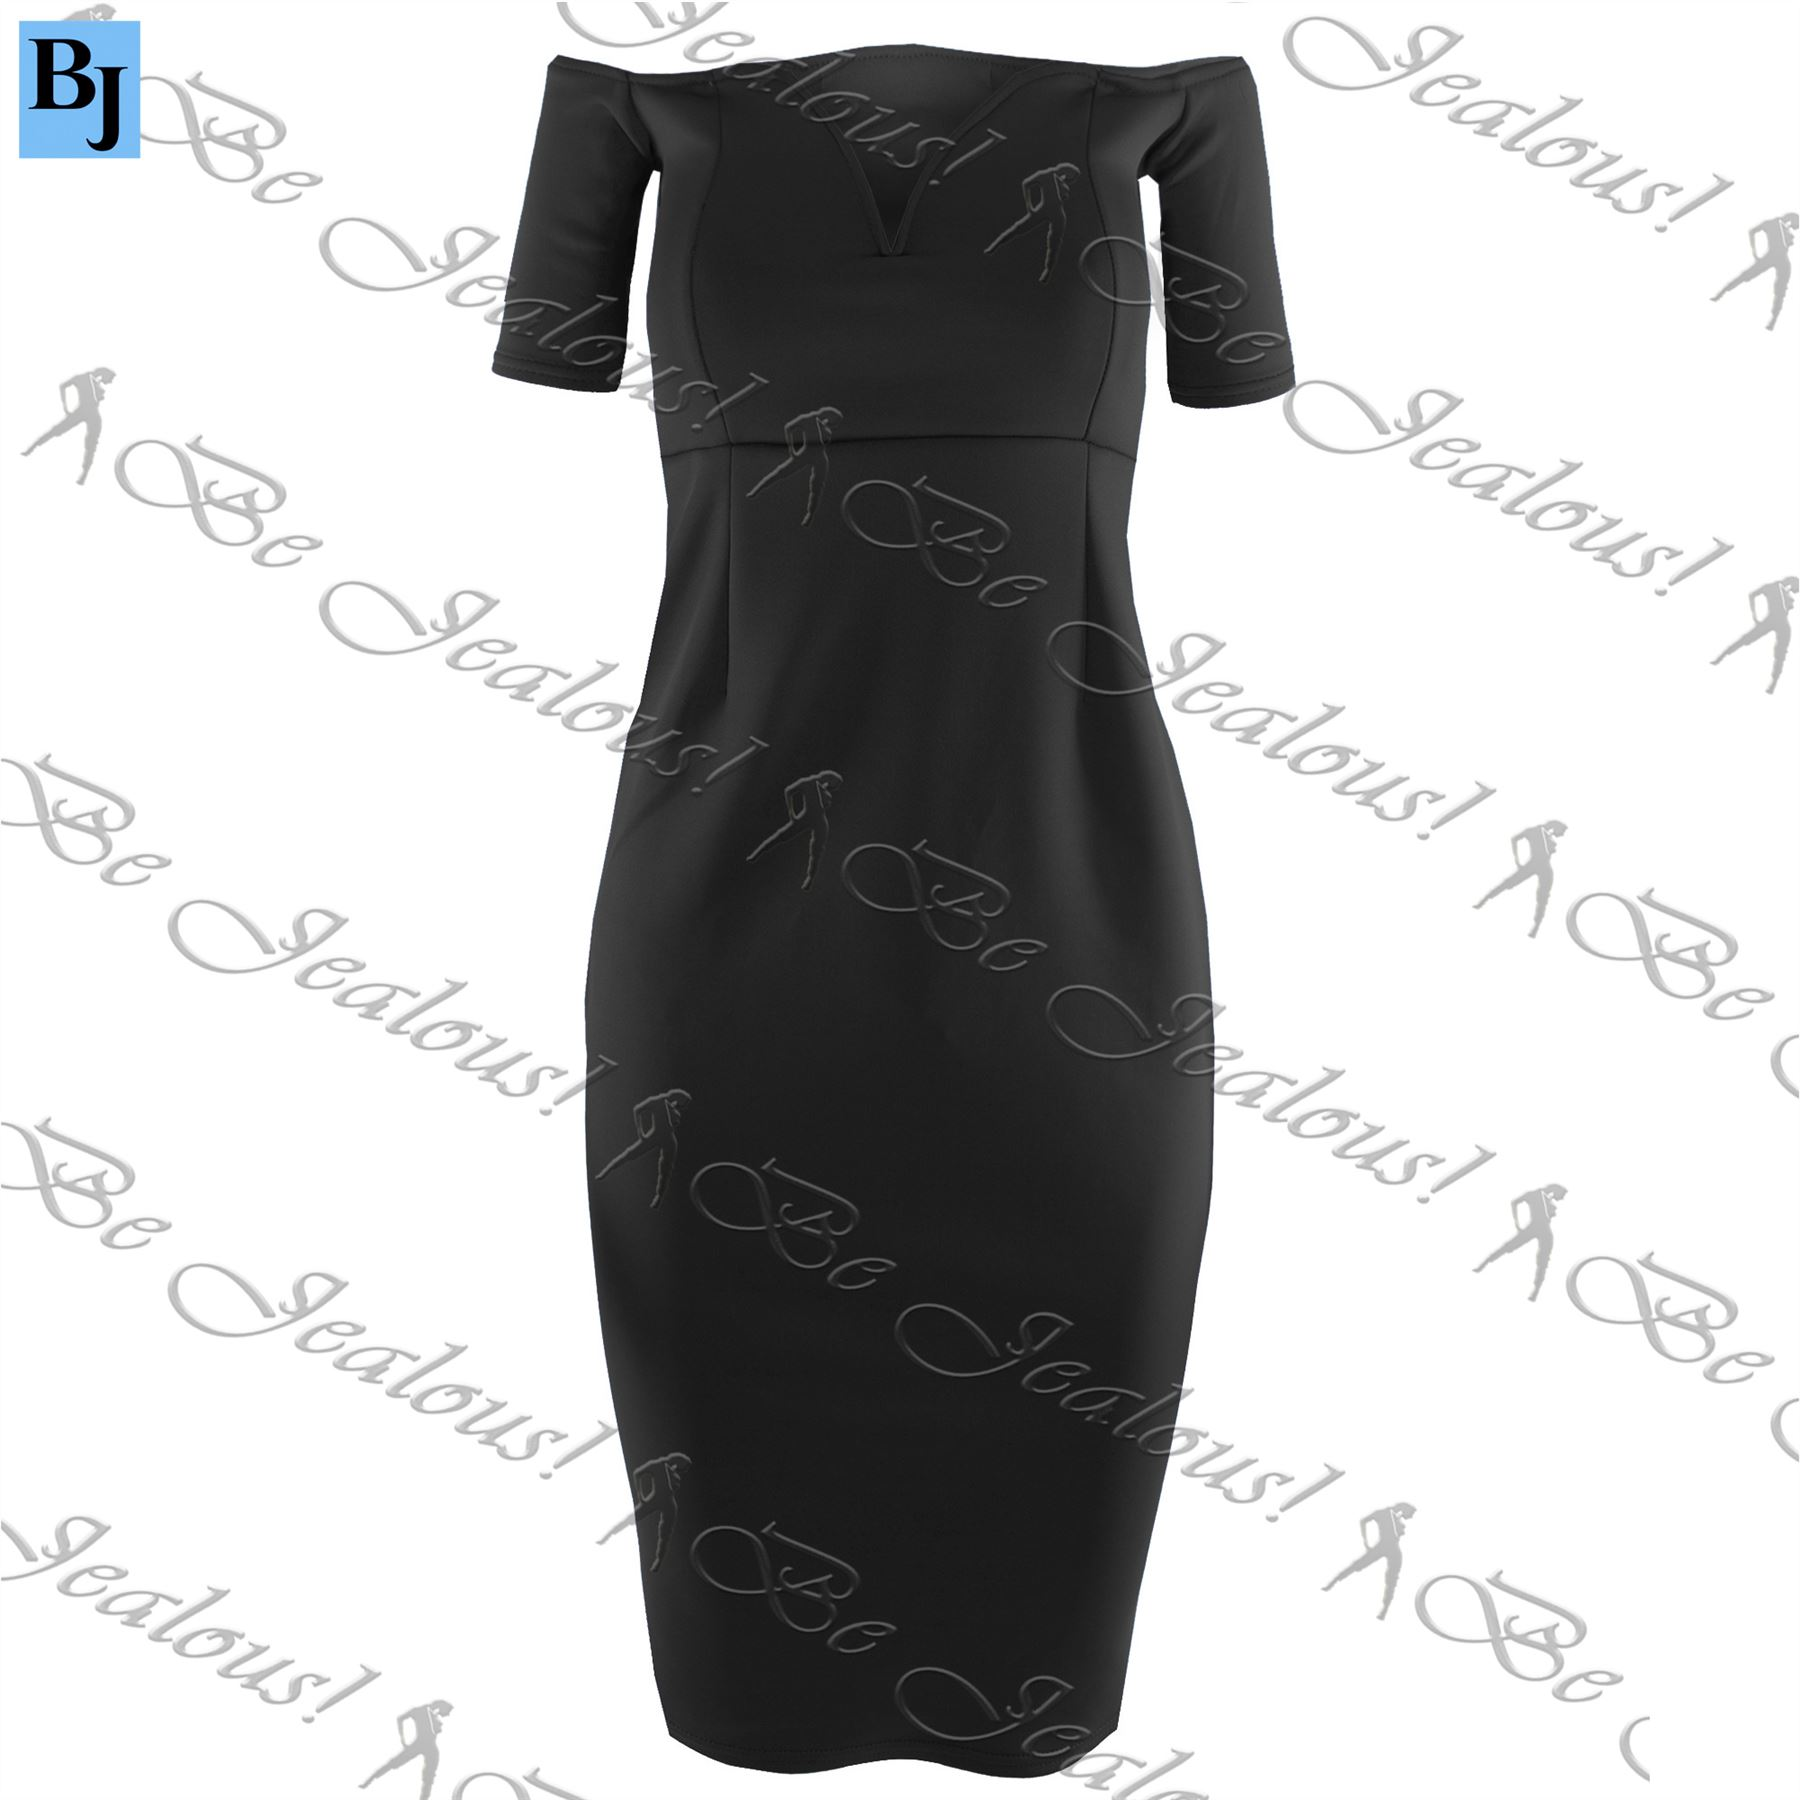 New-Womens-Ladies-Off-Shoulder-V-Neck-Boobtube-Bandeau-Bralet-Bodycon-Midi-Dress